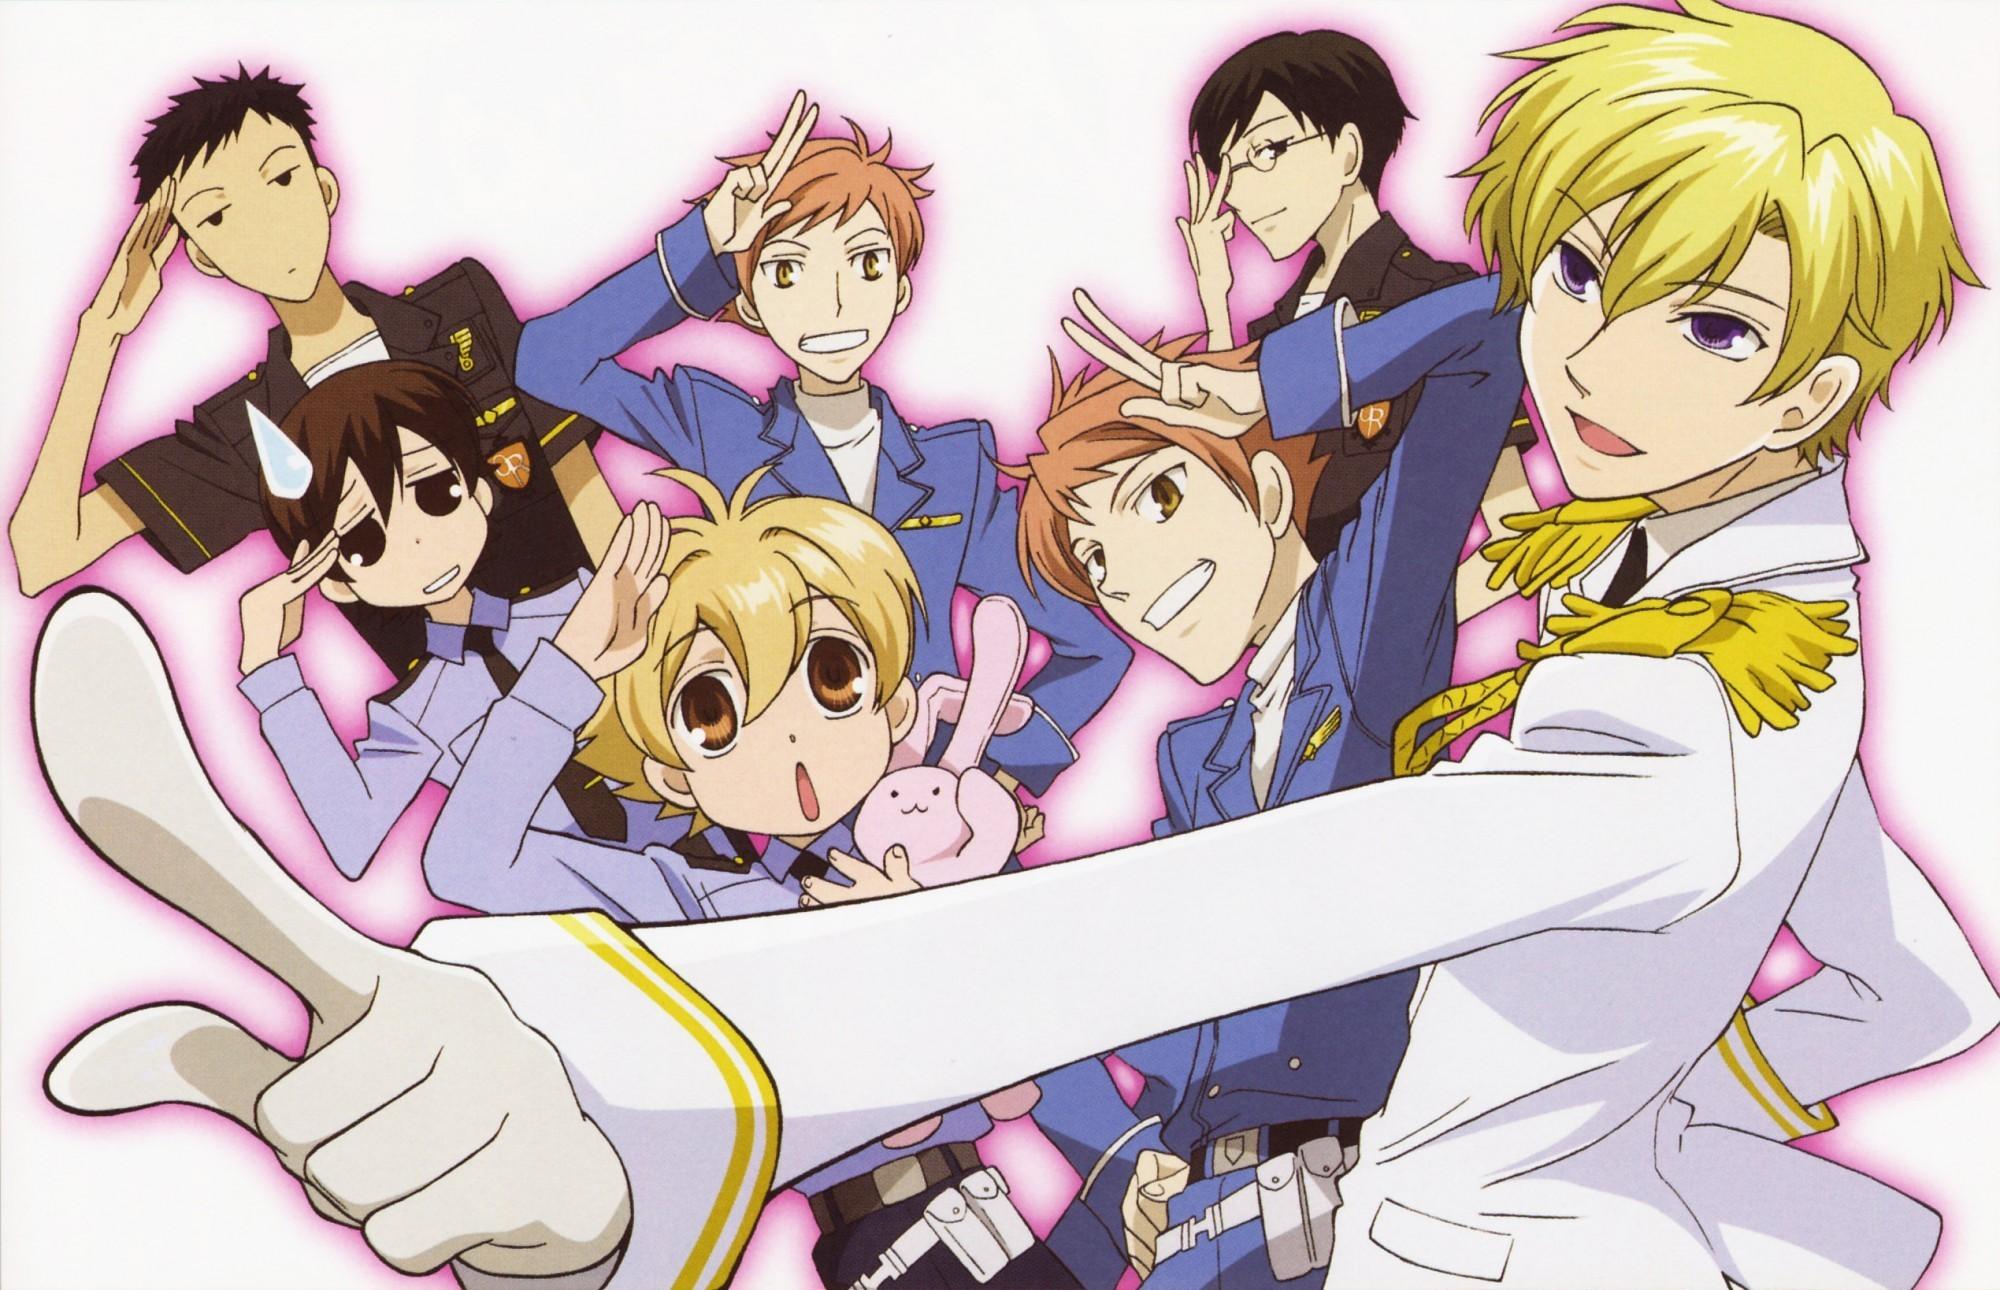 Top 5 Best Gender-Bender Shoujo Mangas I've read | Shojo ...